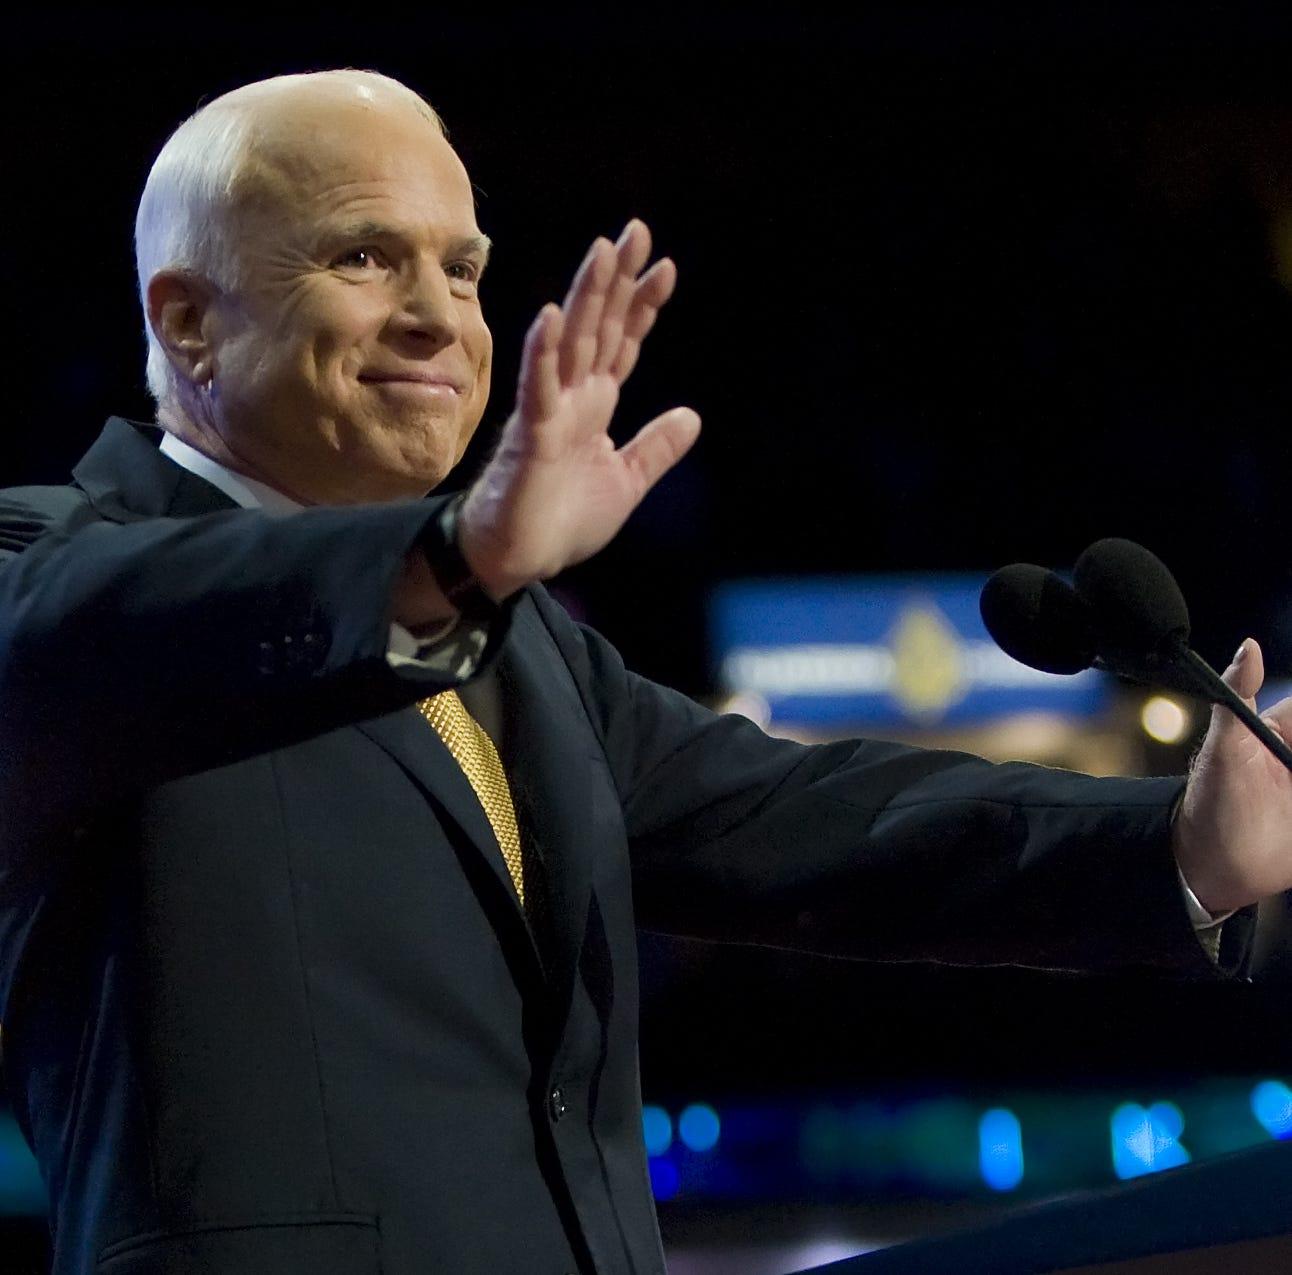 Sen. Martha McSally: John McCain and his family should be respected